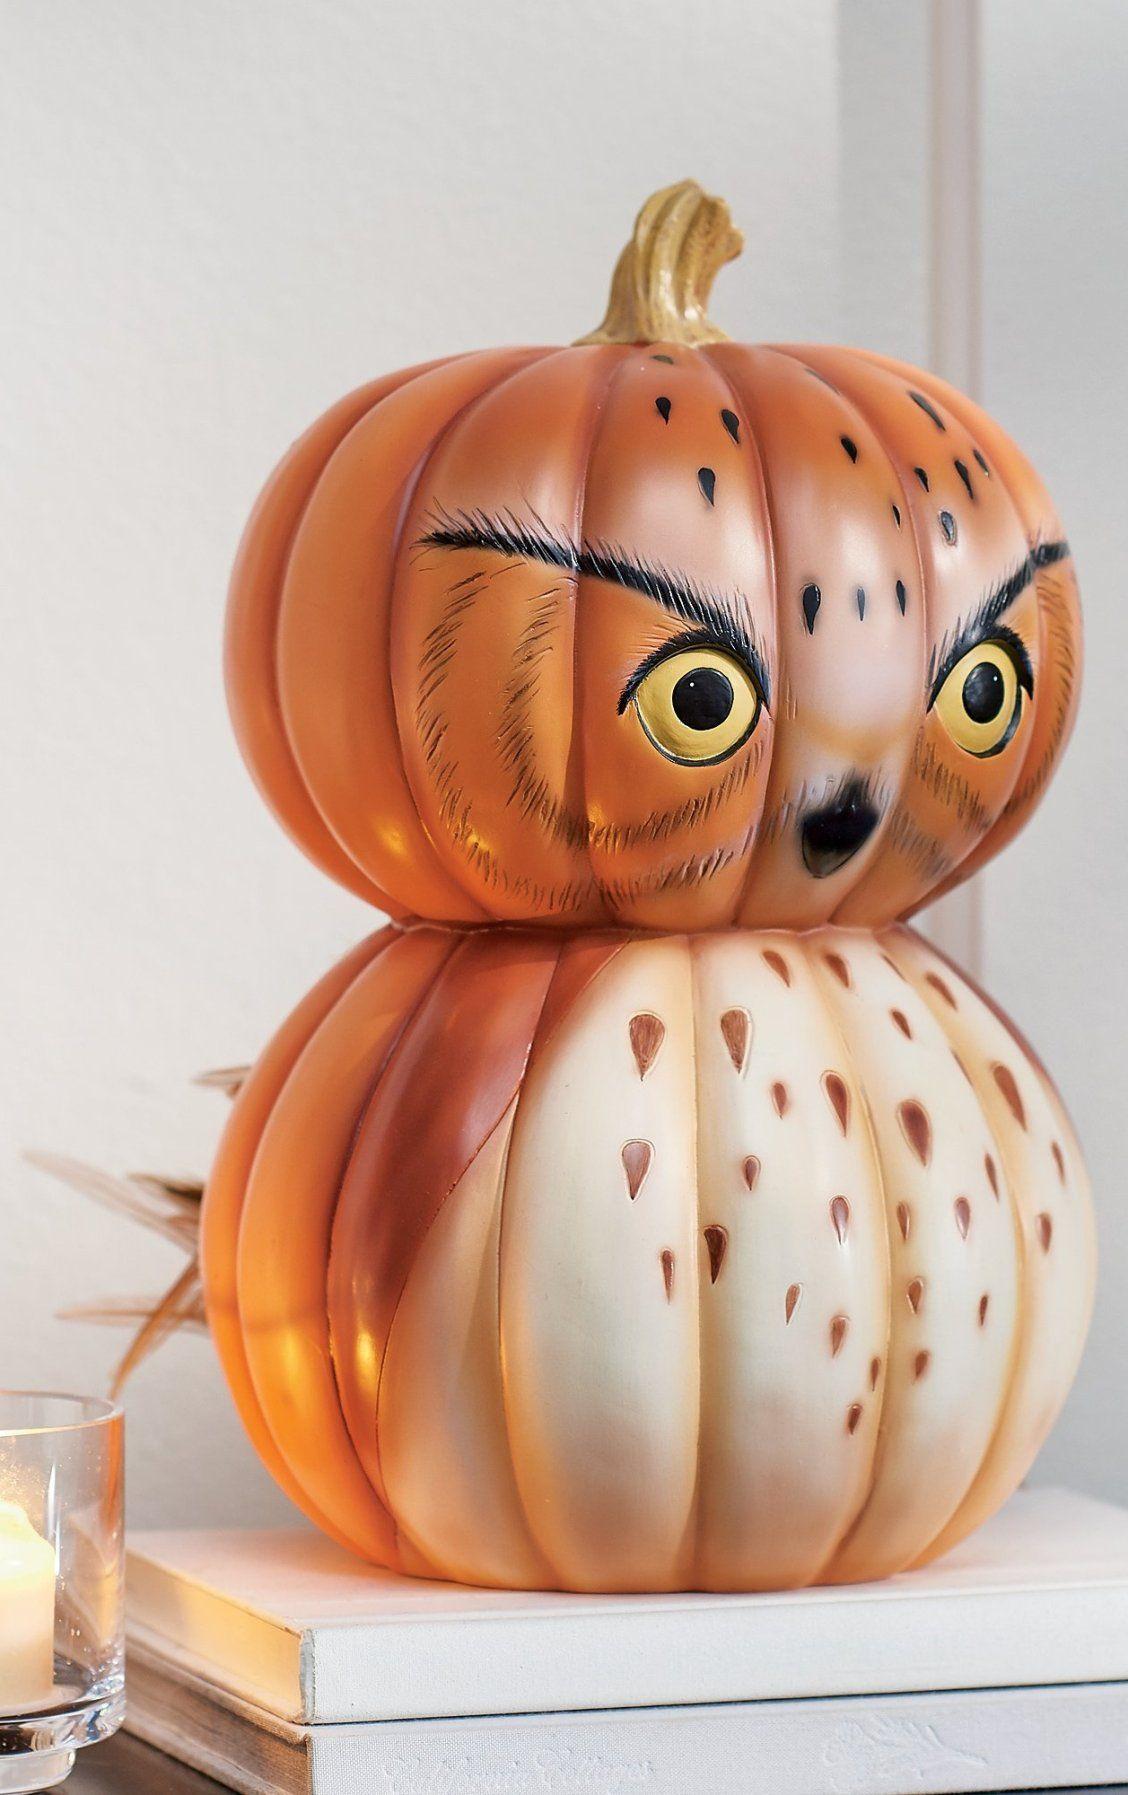 owly wowly pumpkins